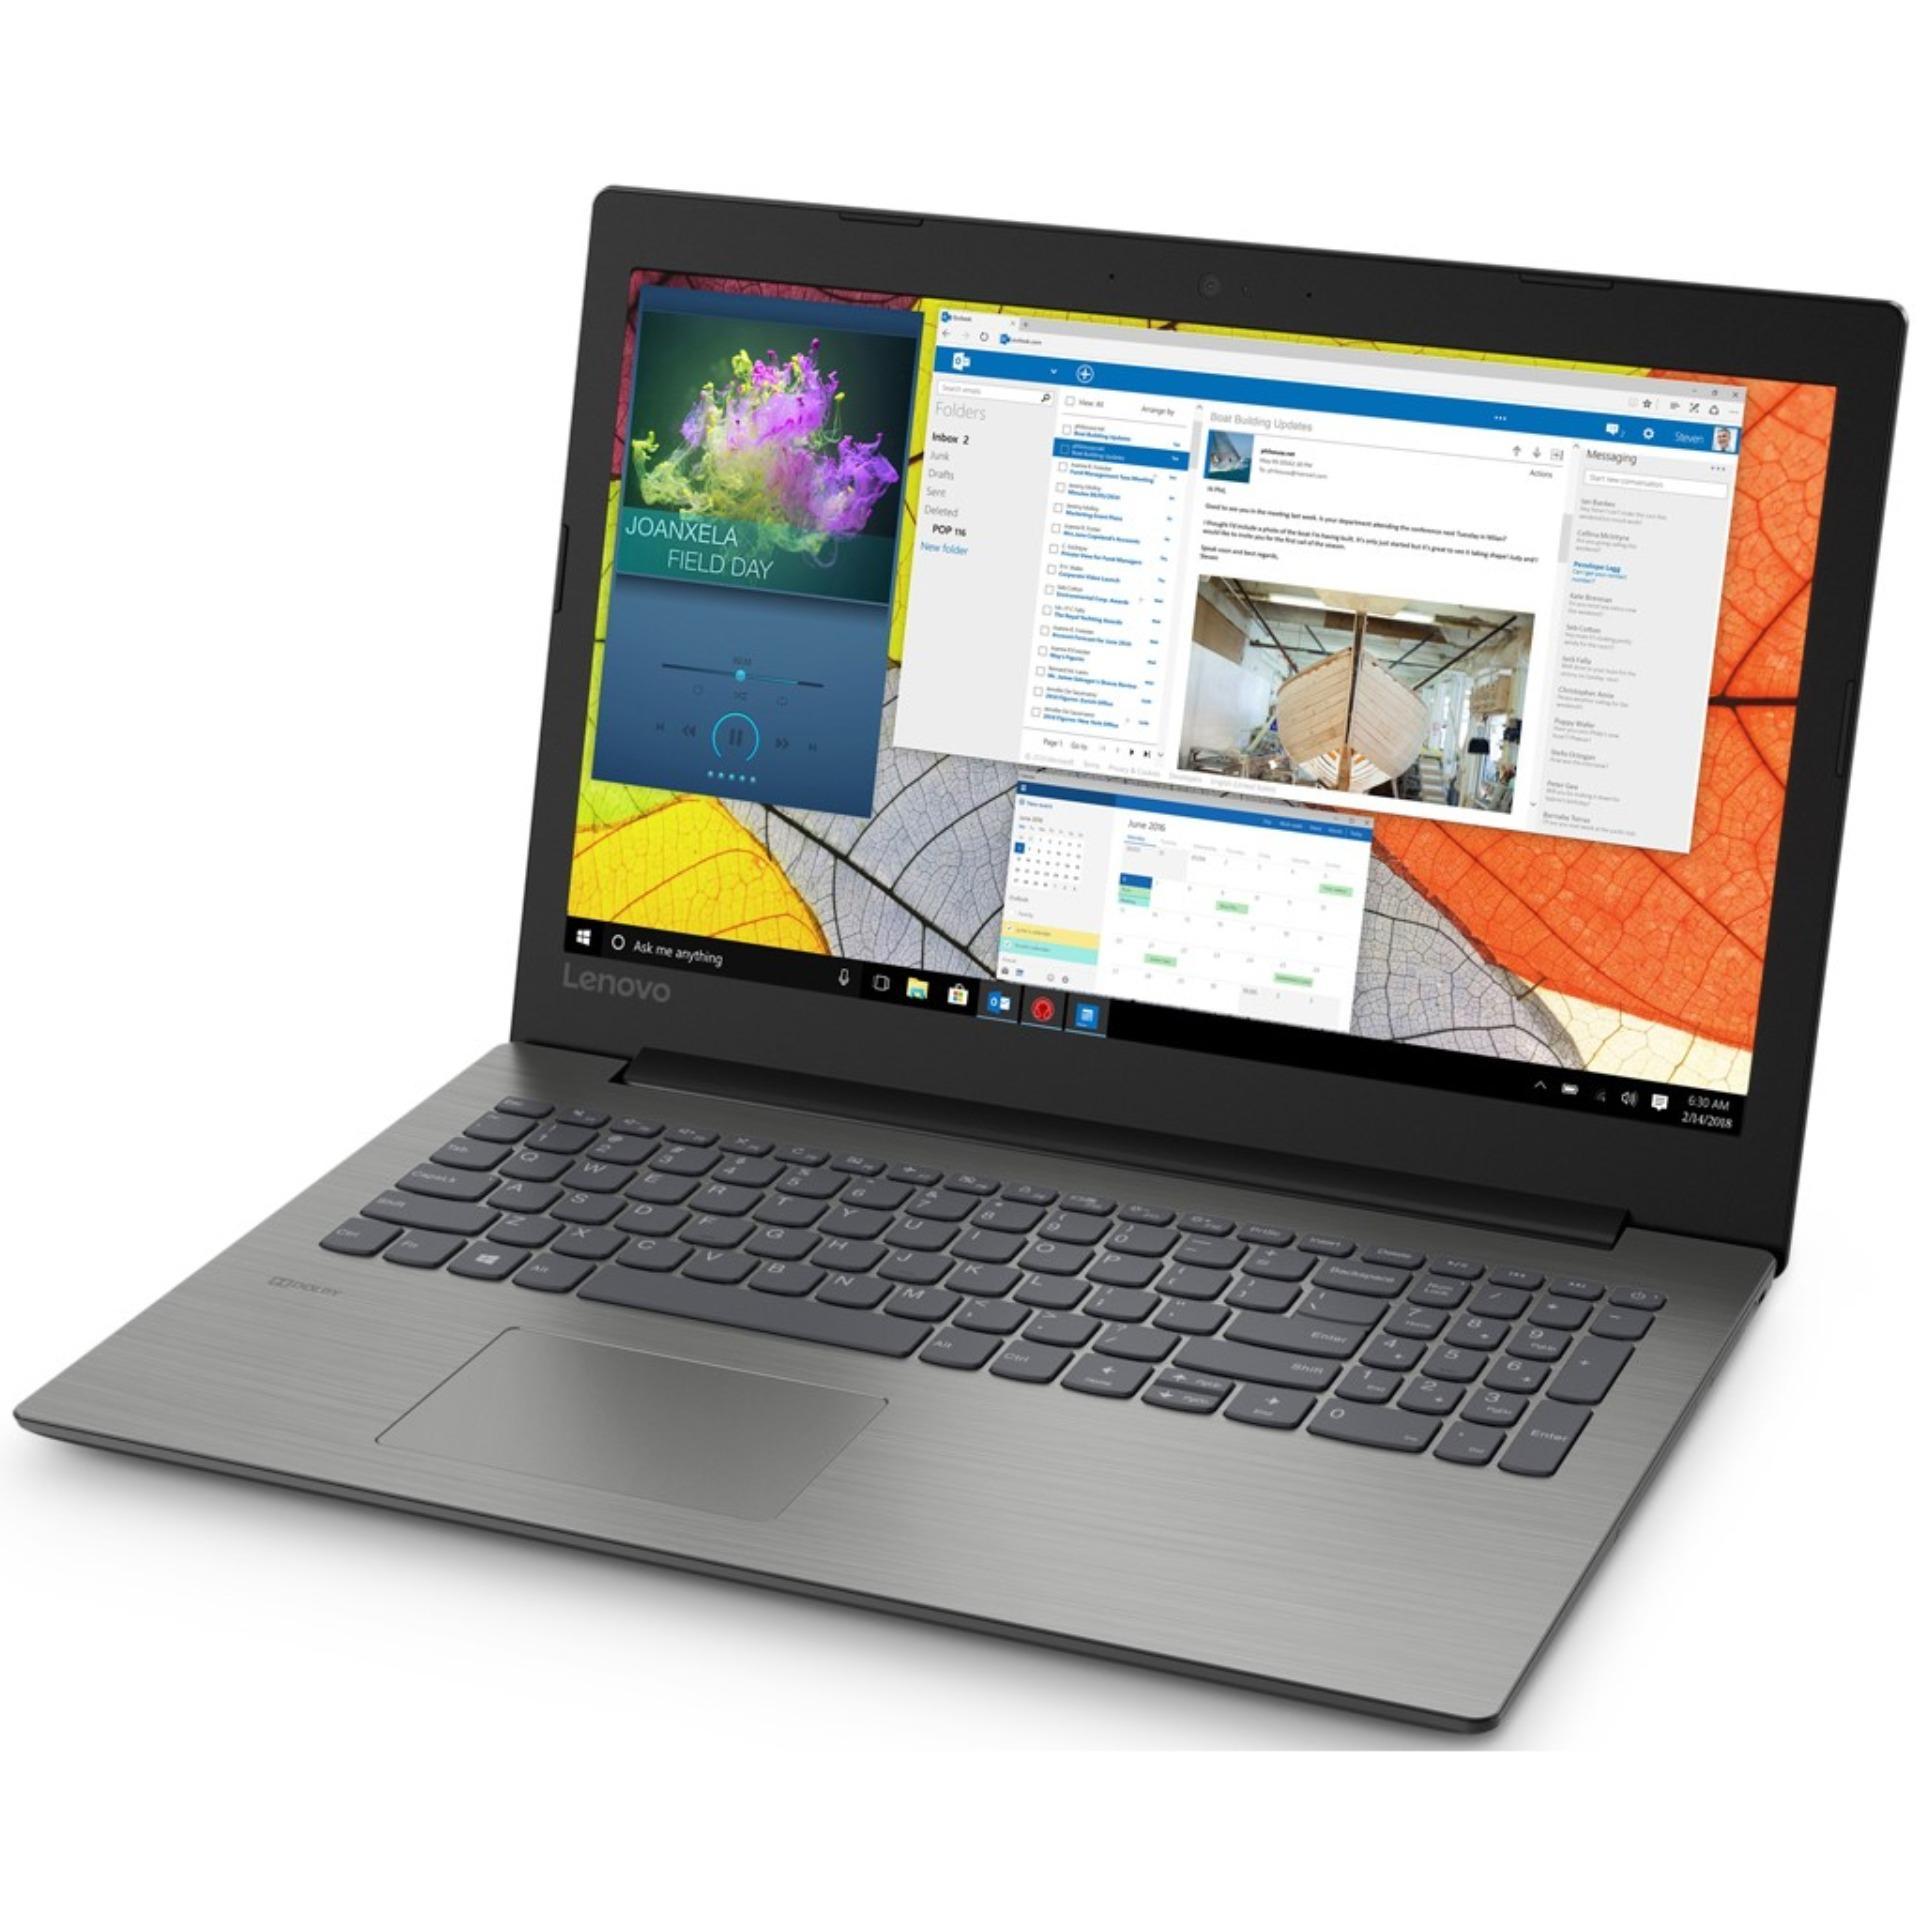 Lenovo Ideapad 330-15ICH-EDID Platinum (Intel Core i7-8750H - RAM 4GB DDR4+16GB Intel Optane - HDD 1TB - NVidia GTX1050 4GB - Windows 10 Home - 15.6